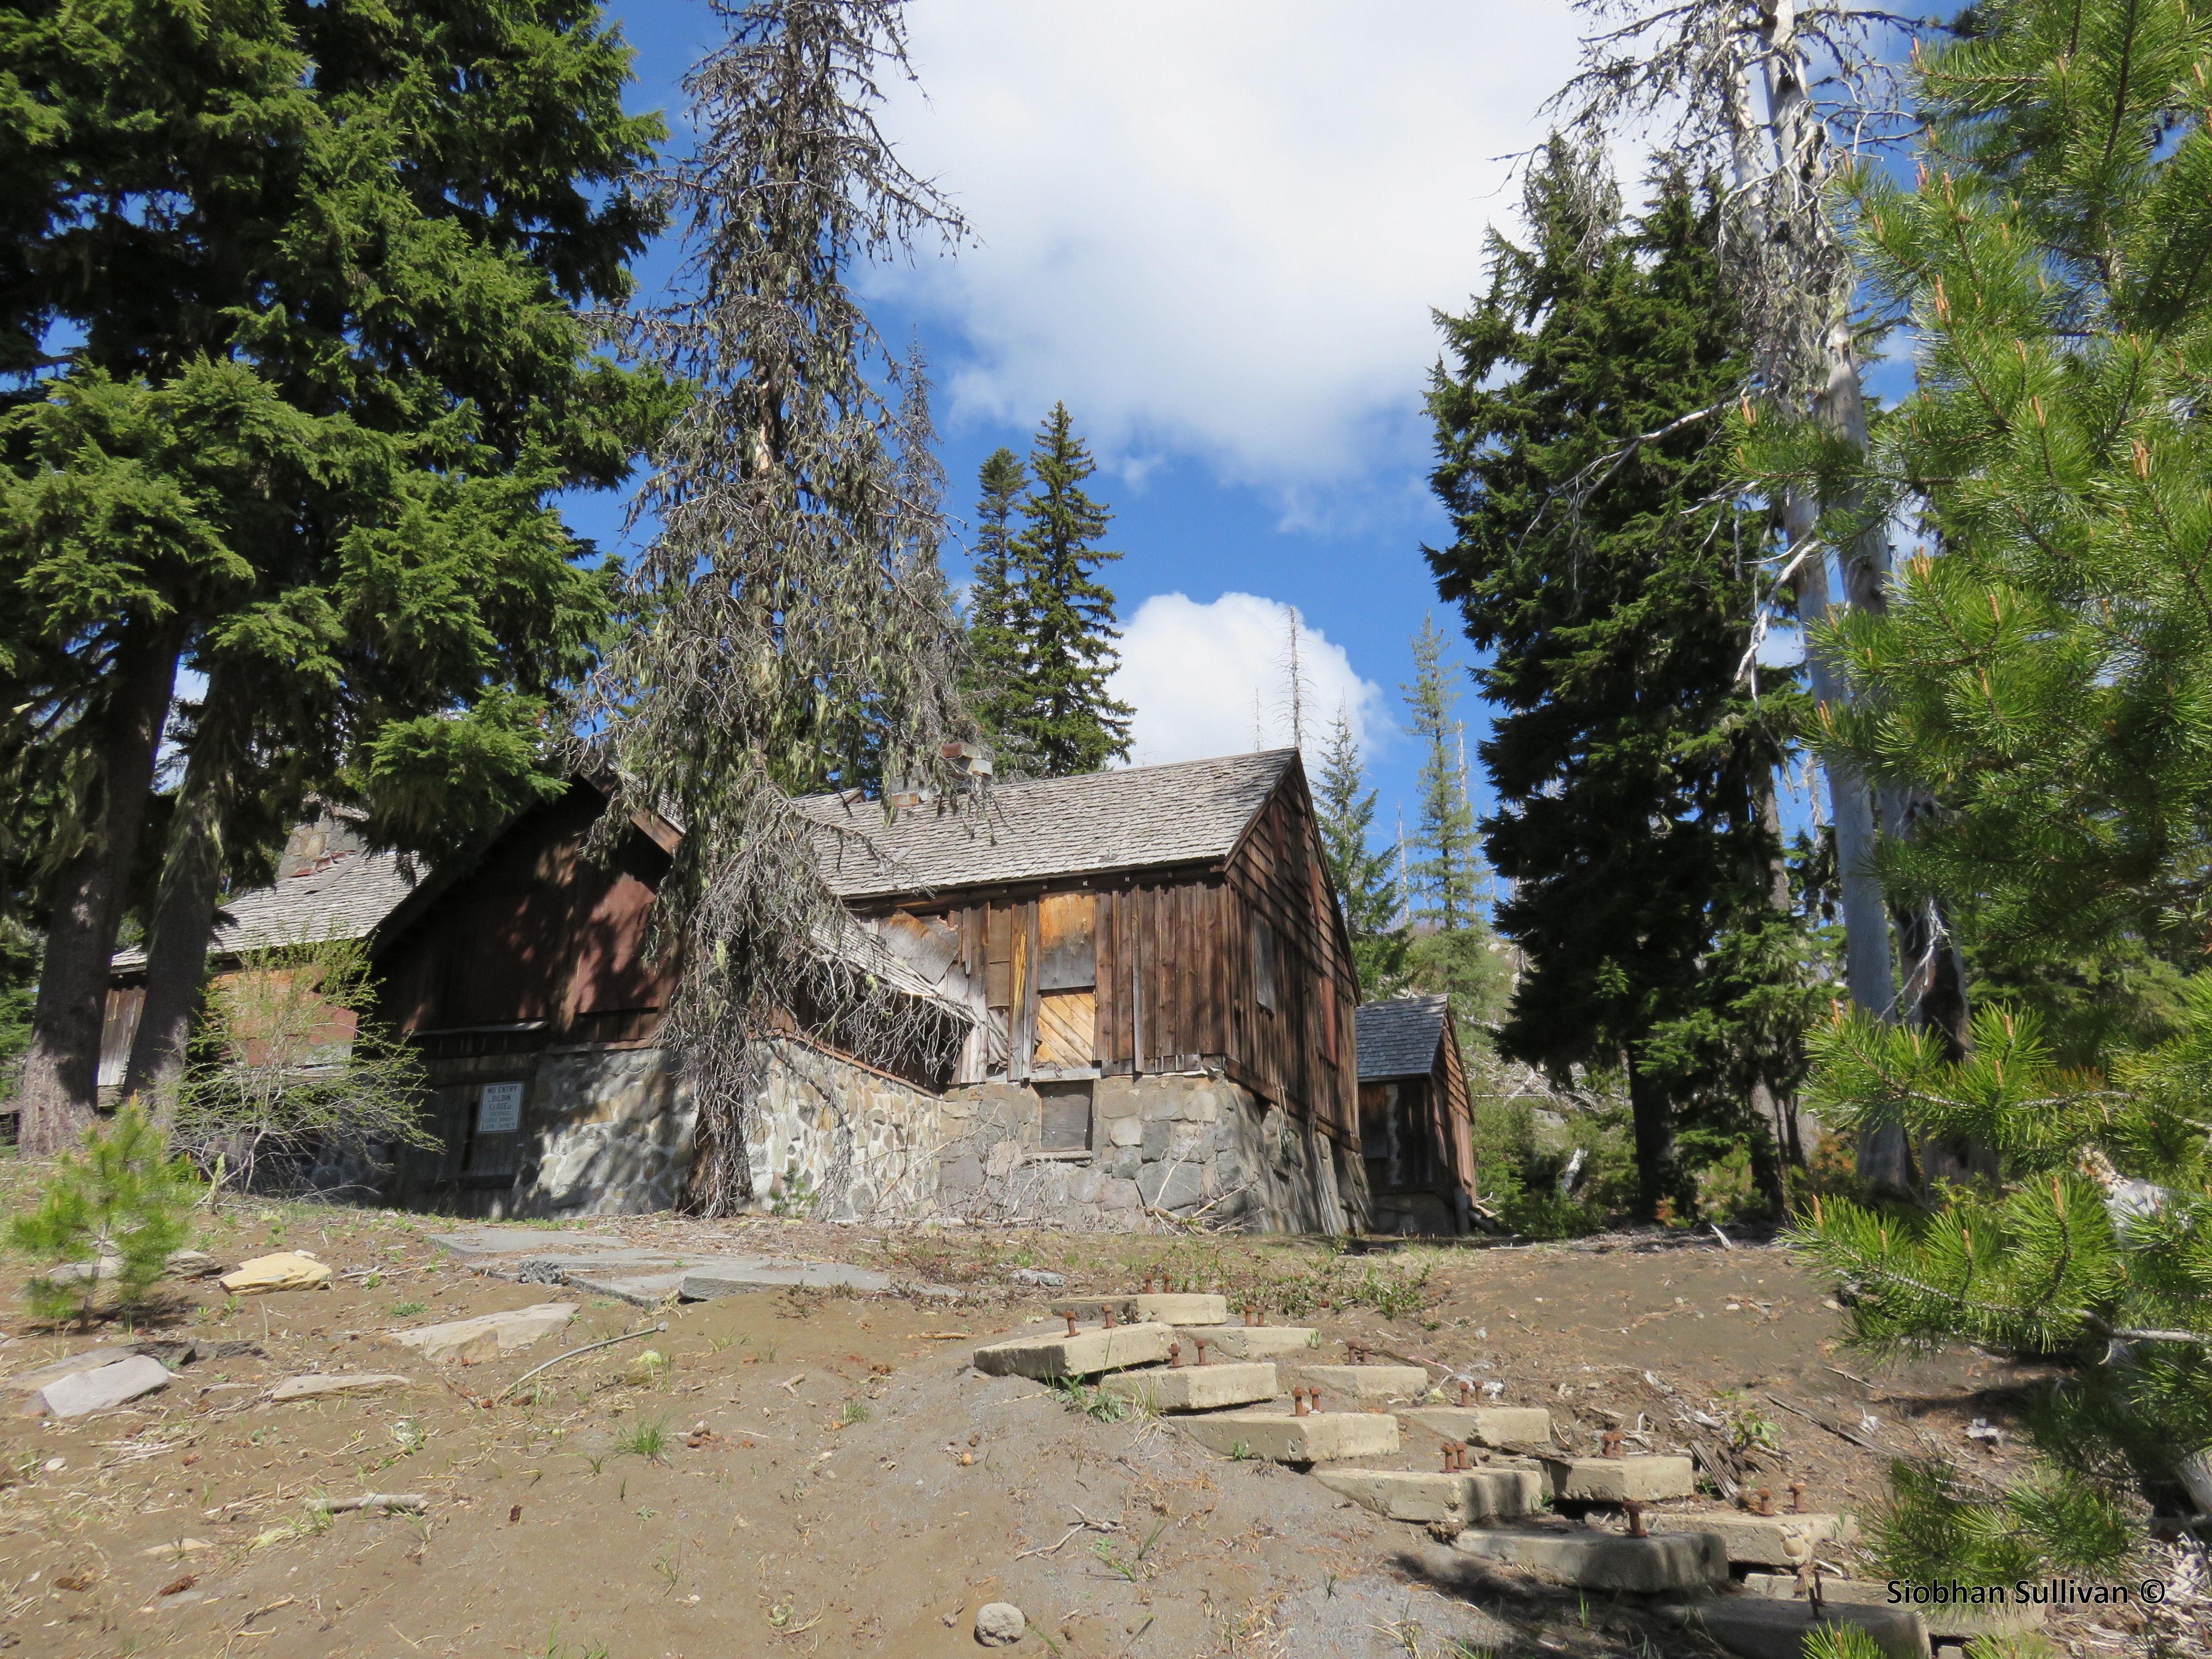 Santiam Mckay Bay Lodge